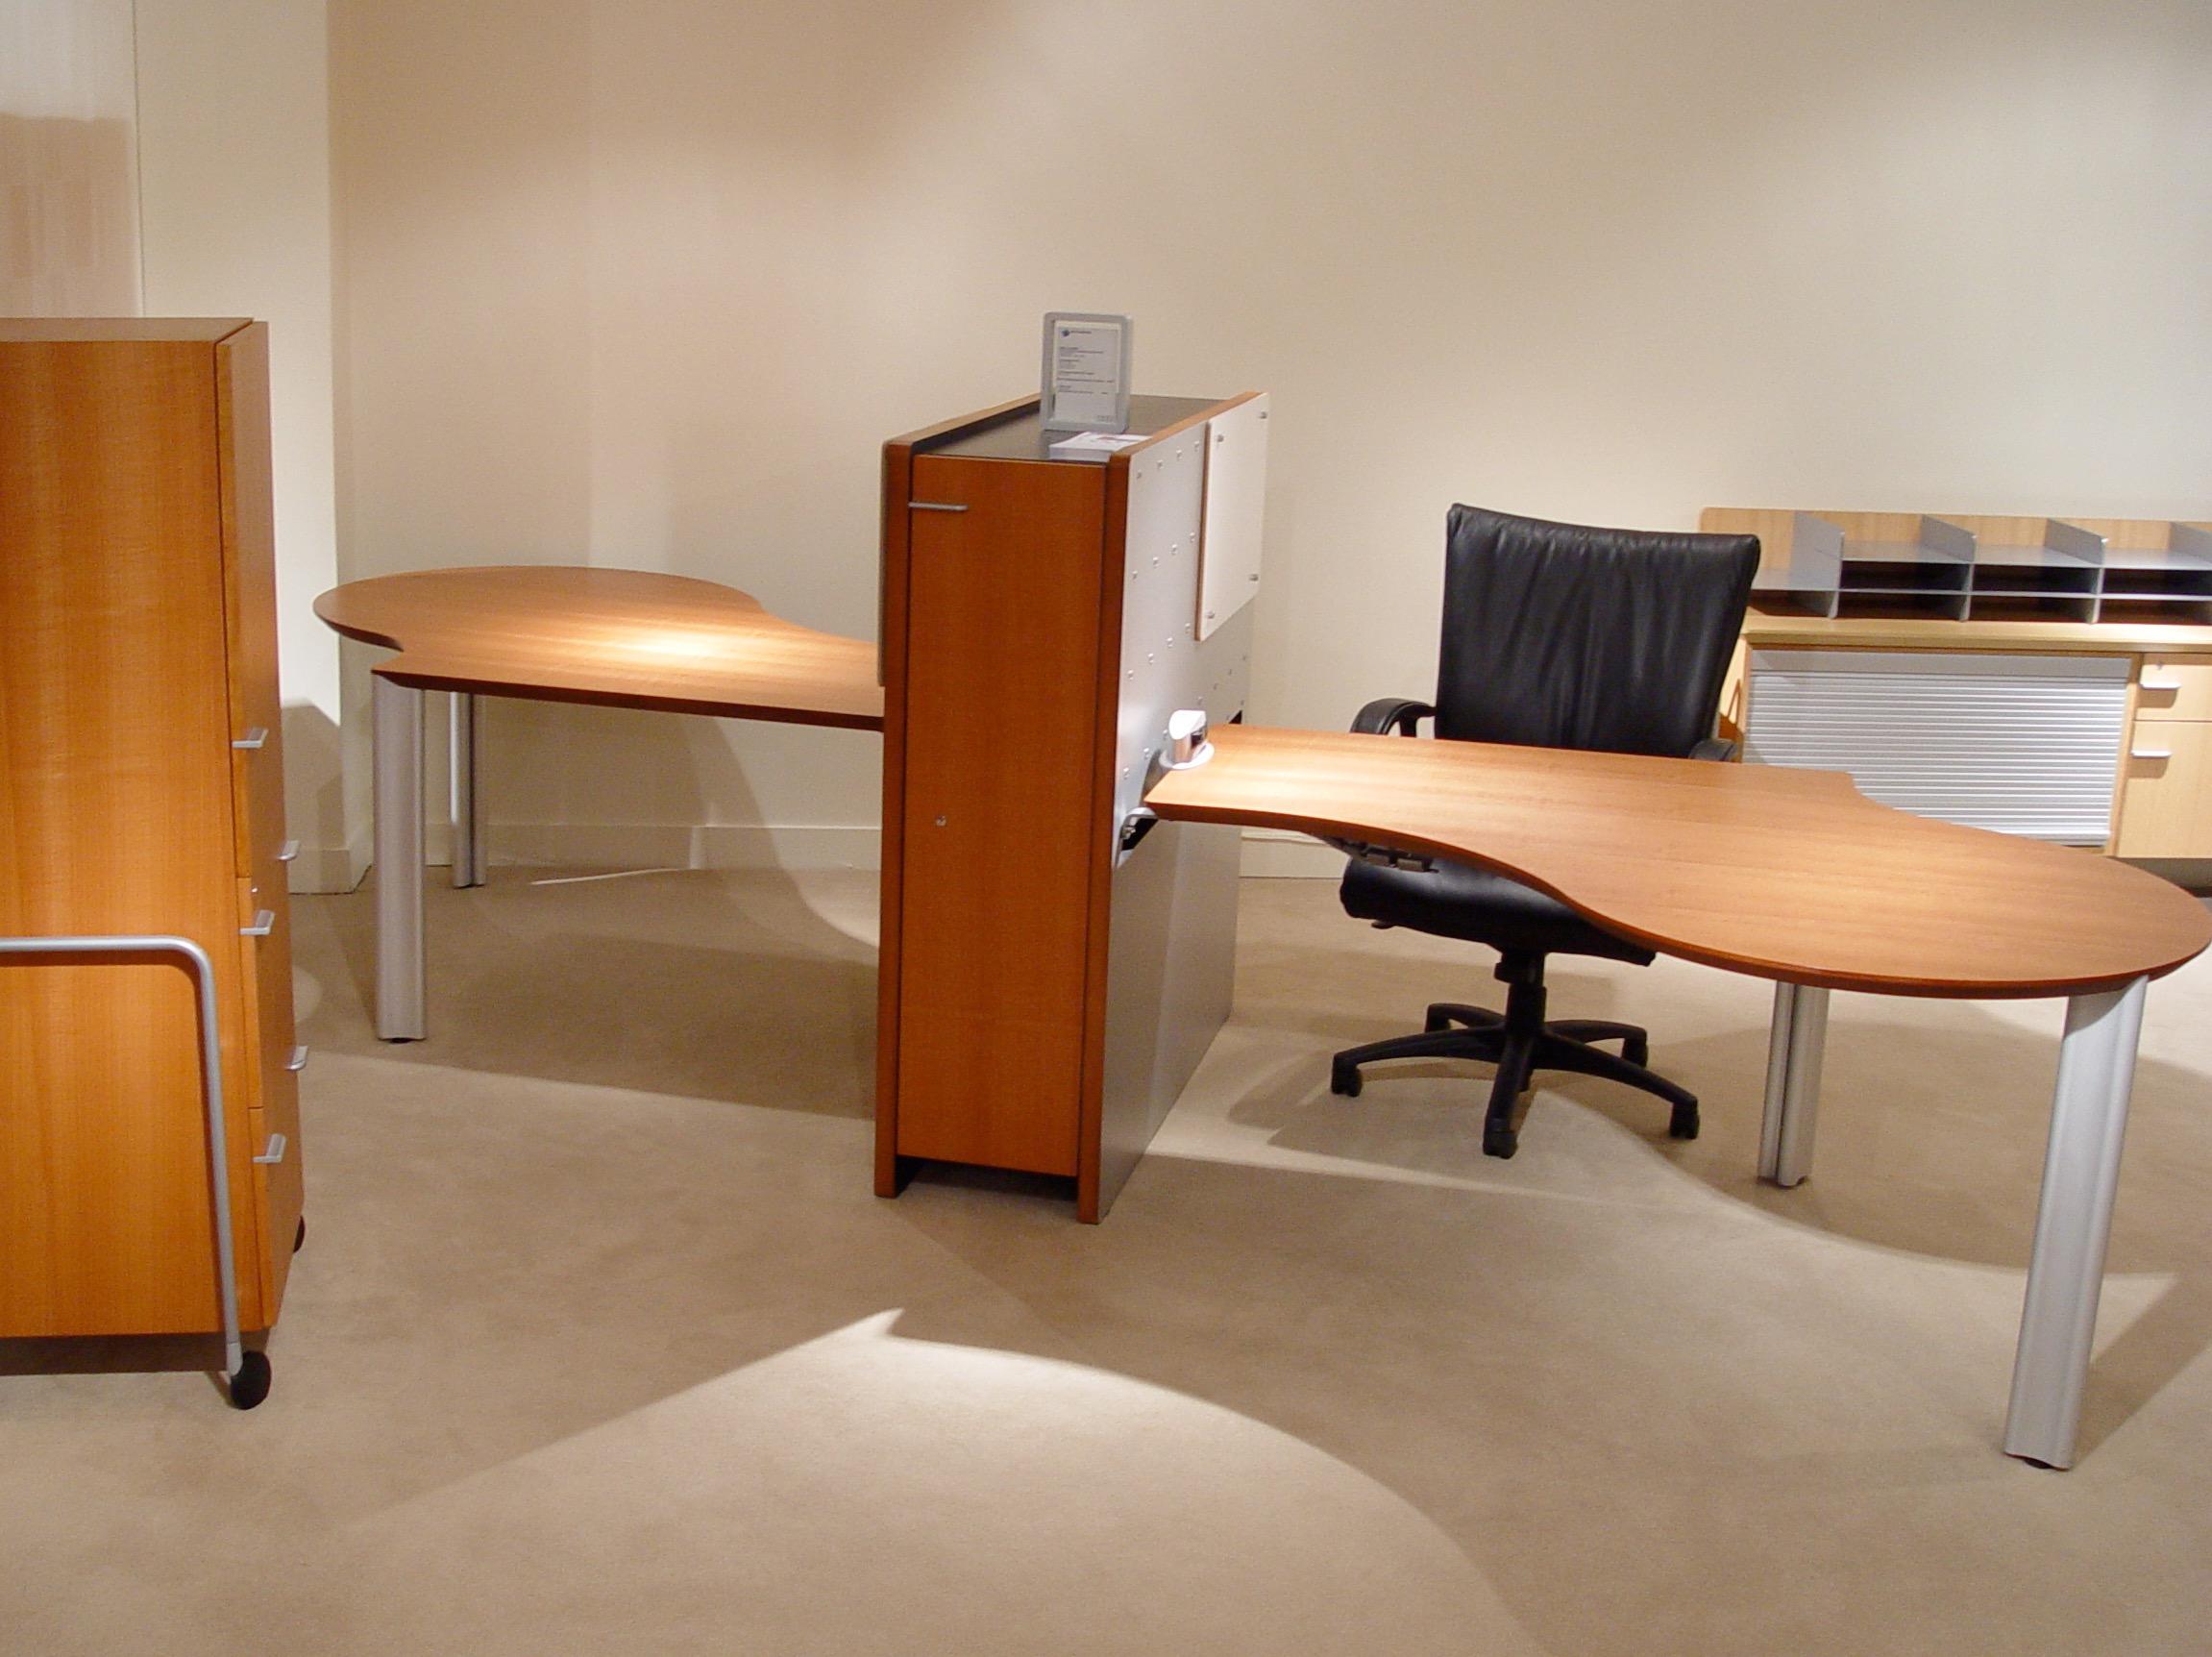 osso collaborative desks